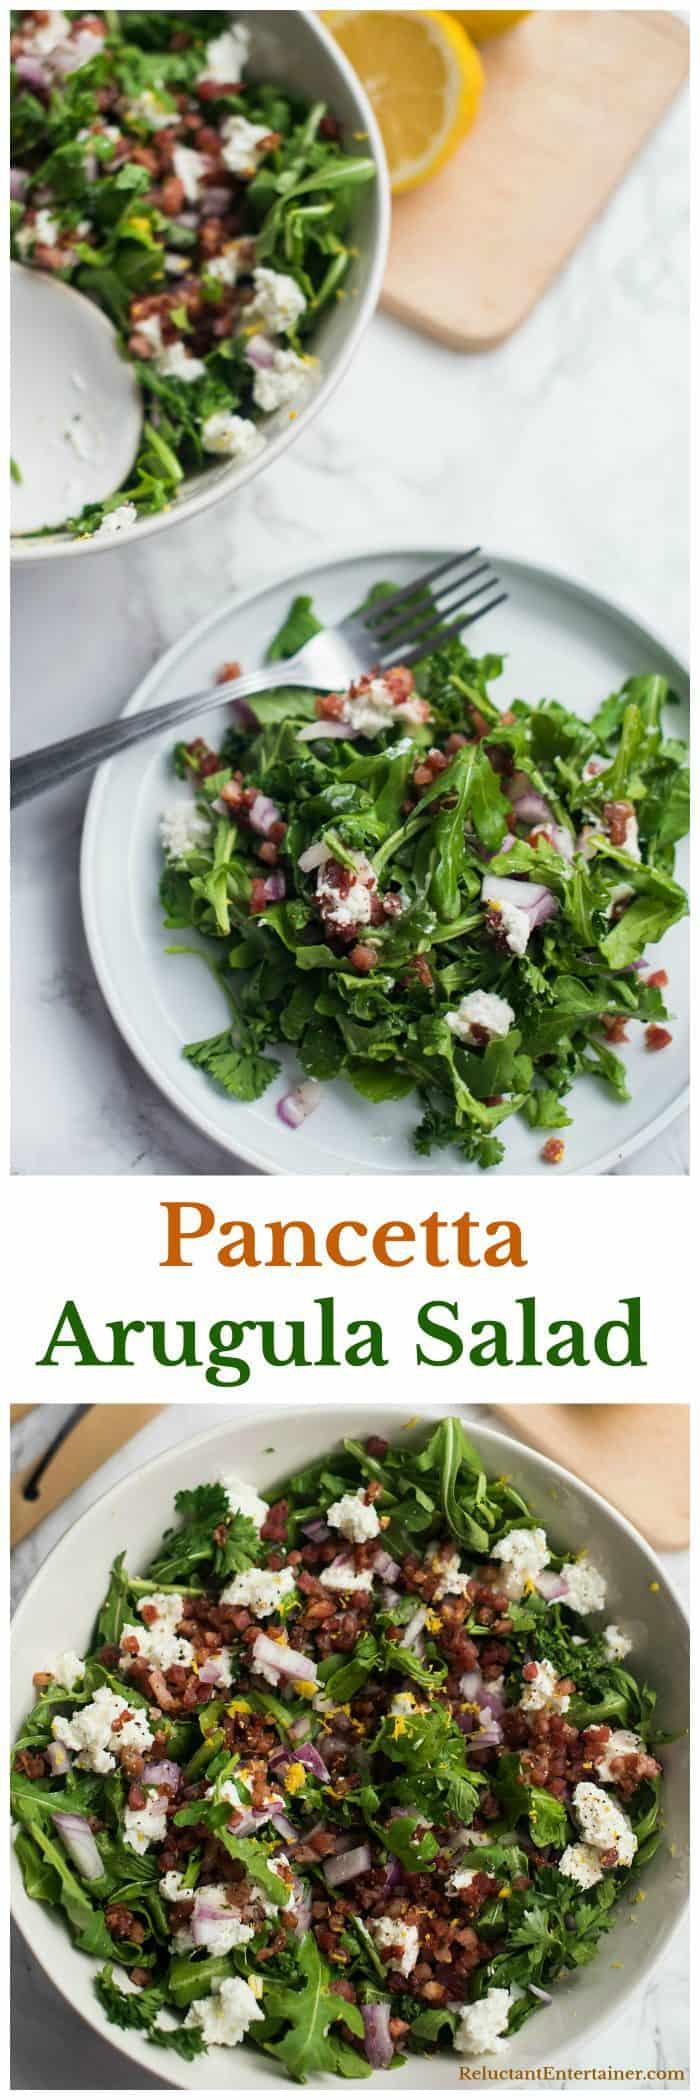 Parsley Pancetta Arugula Salad Recipes